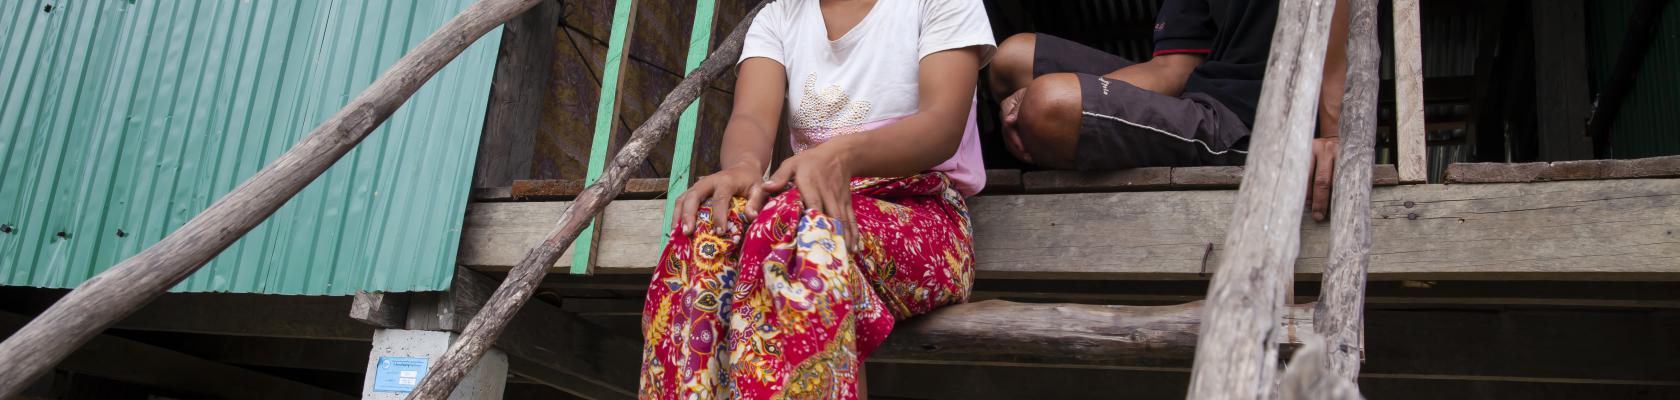 cambodia afd agence fran aise de d veloppement. Black Bedroom Furniture Sets. Home Design Ideas